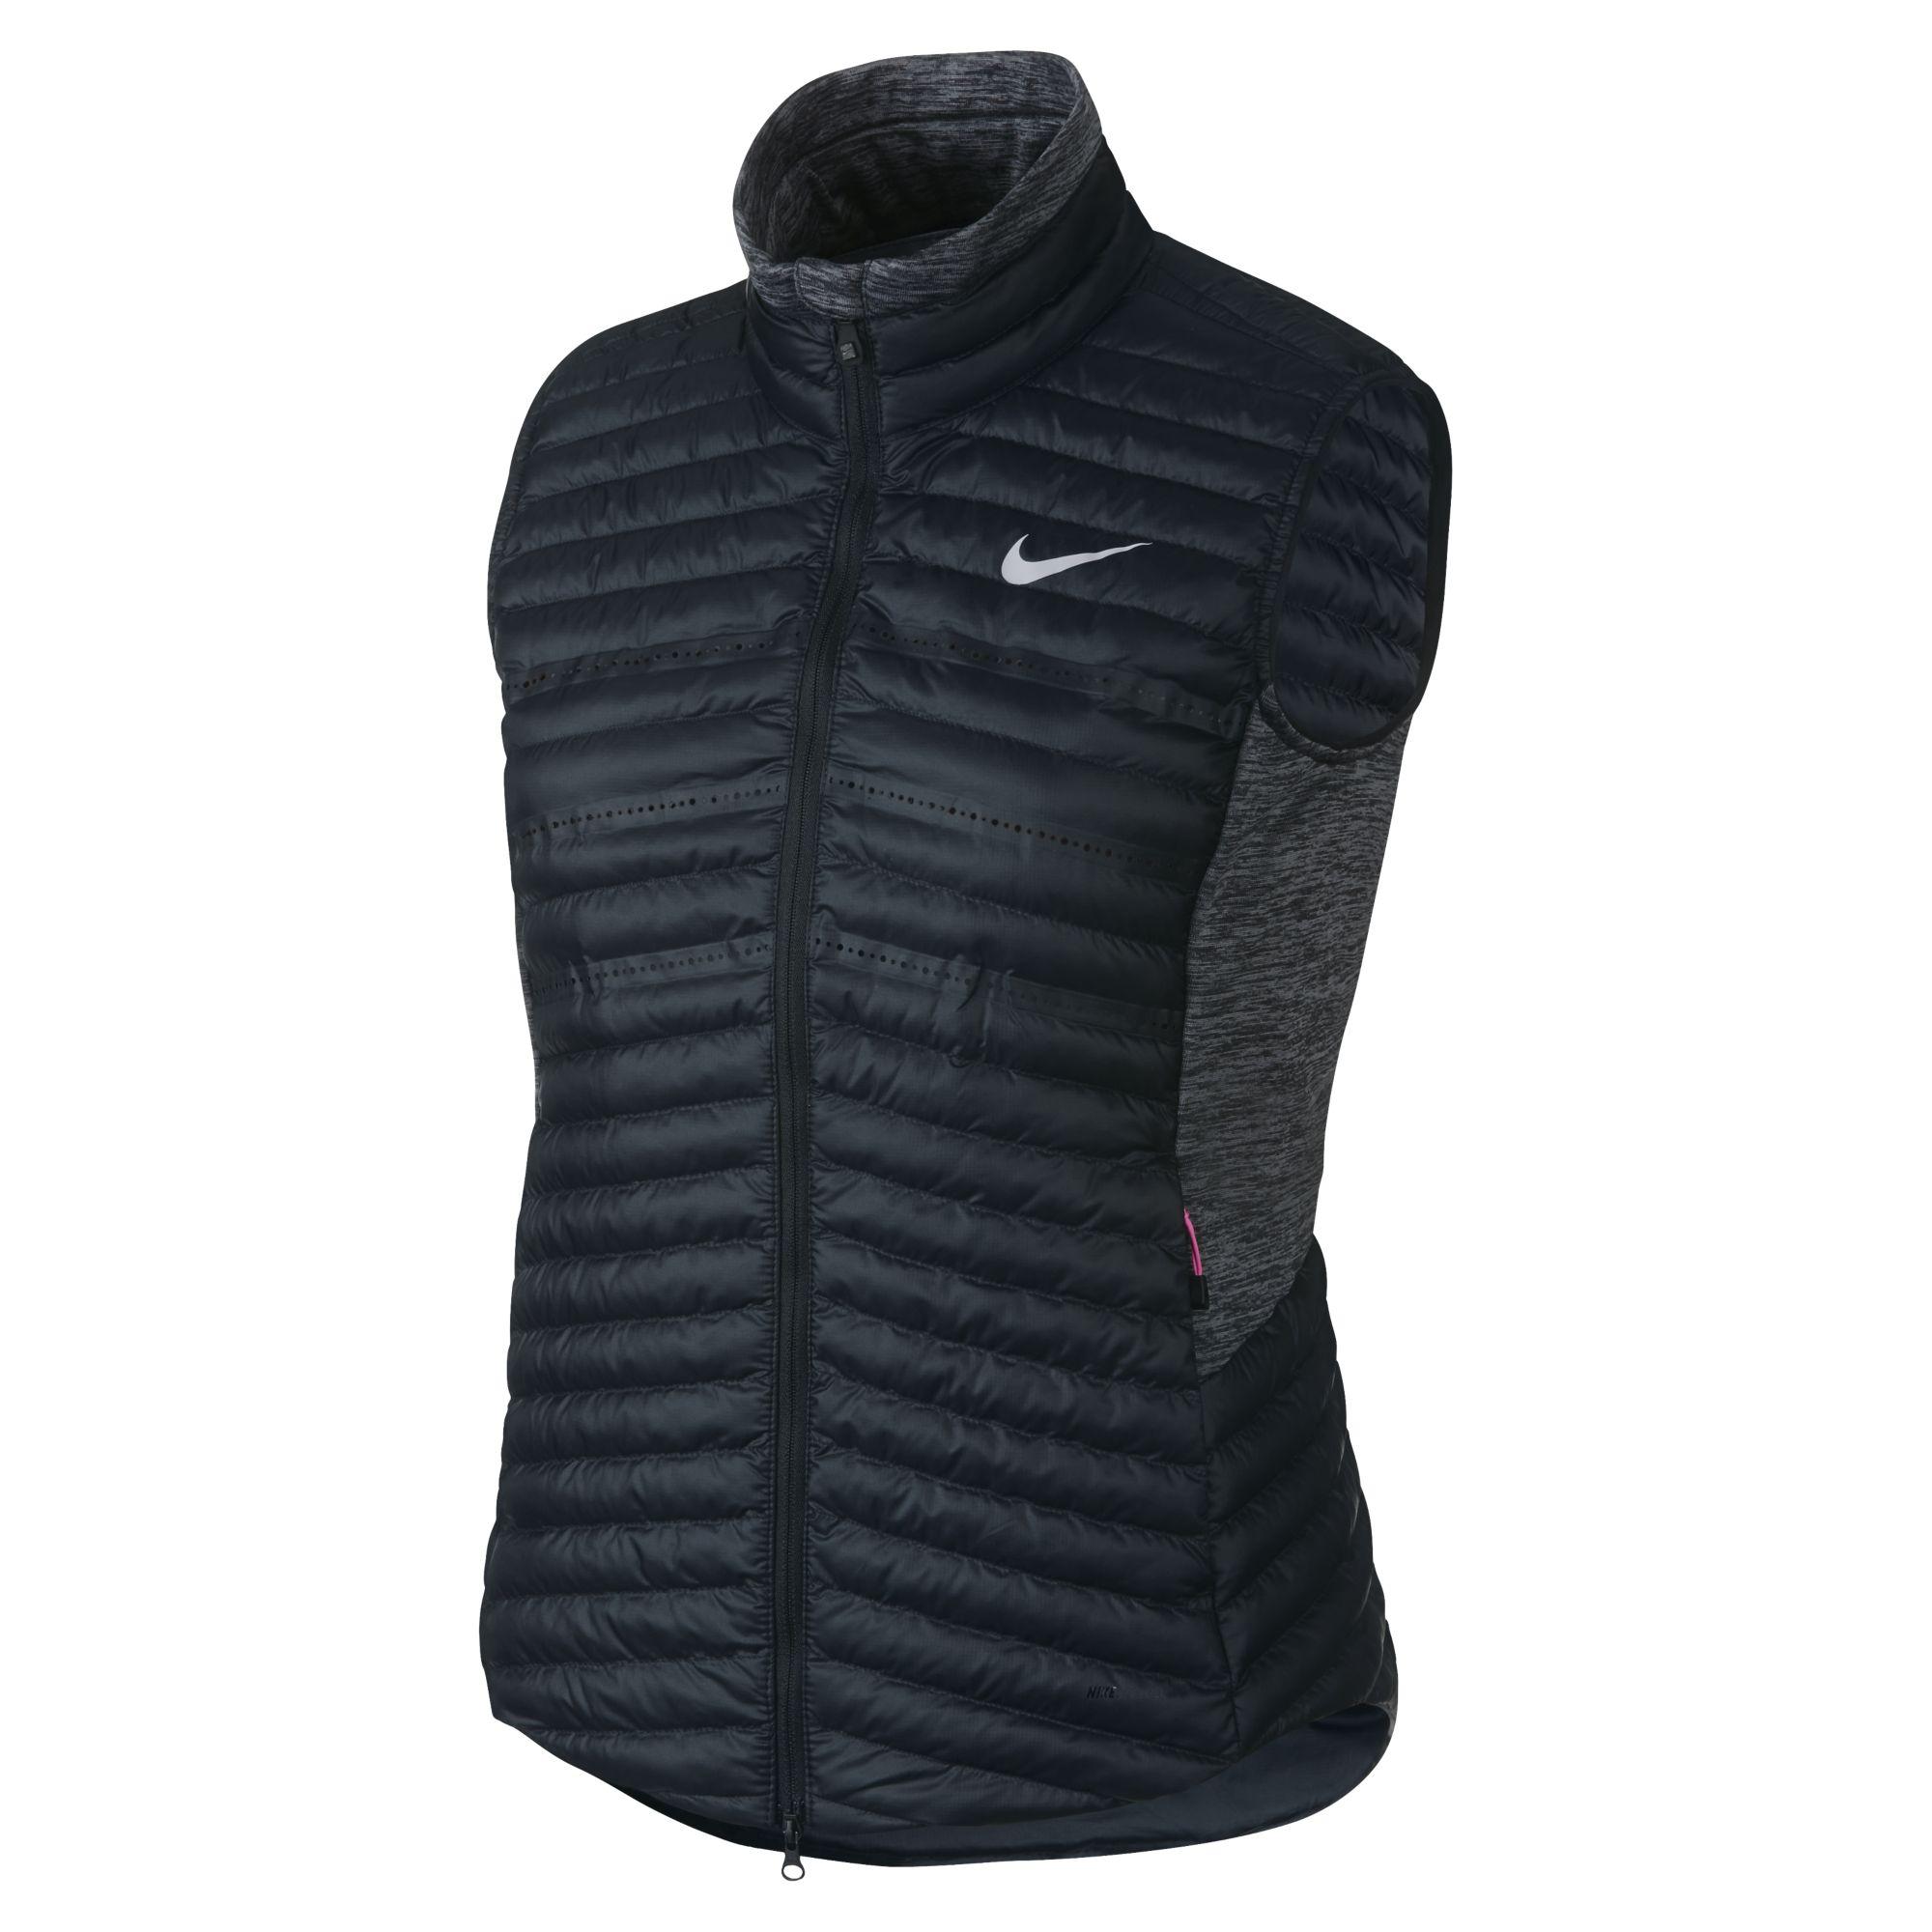 Nike Women's Aeroloft Golf Vest, Black, Large